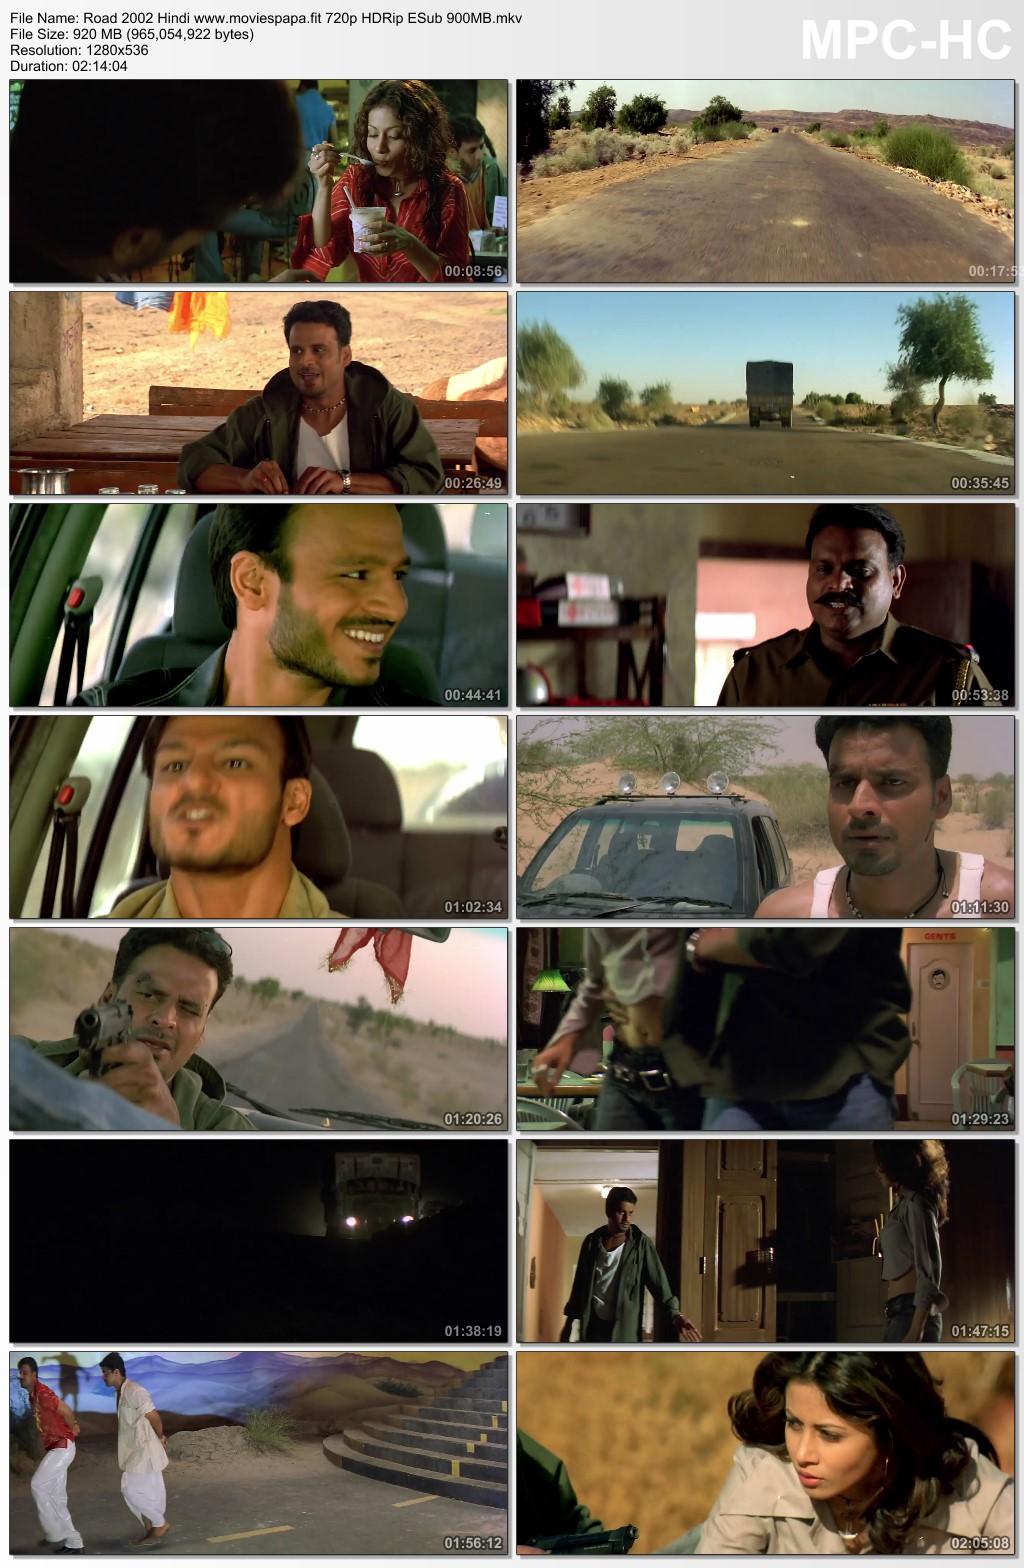 Road 2002 Hindi Movie 720p HDRip ESub 950MB Download